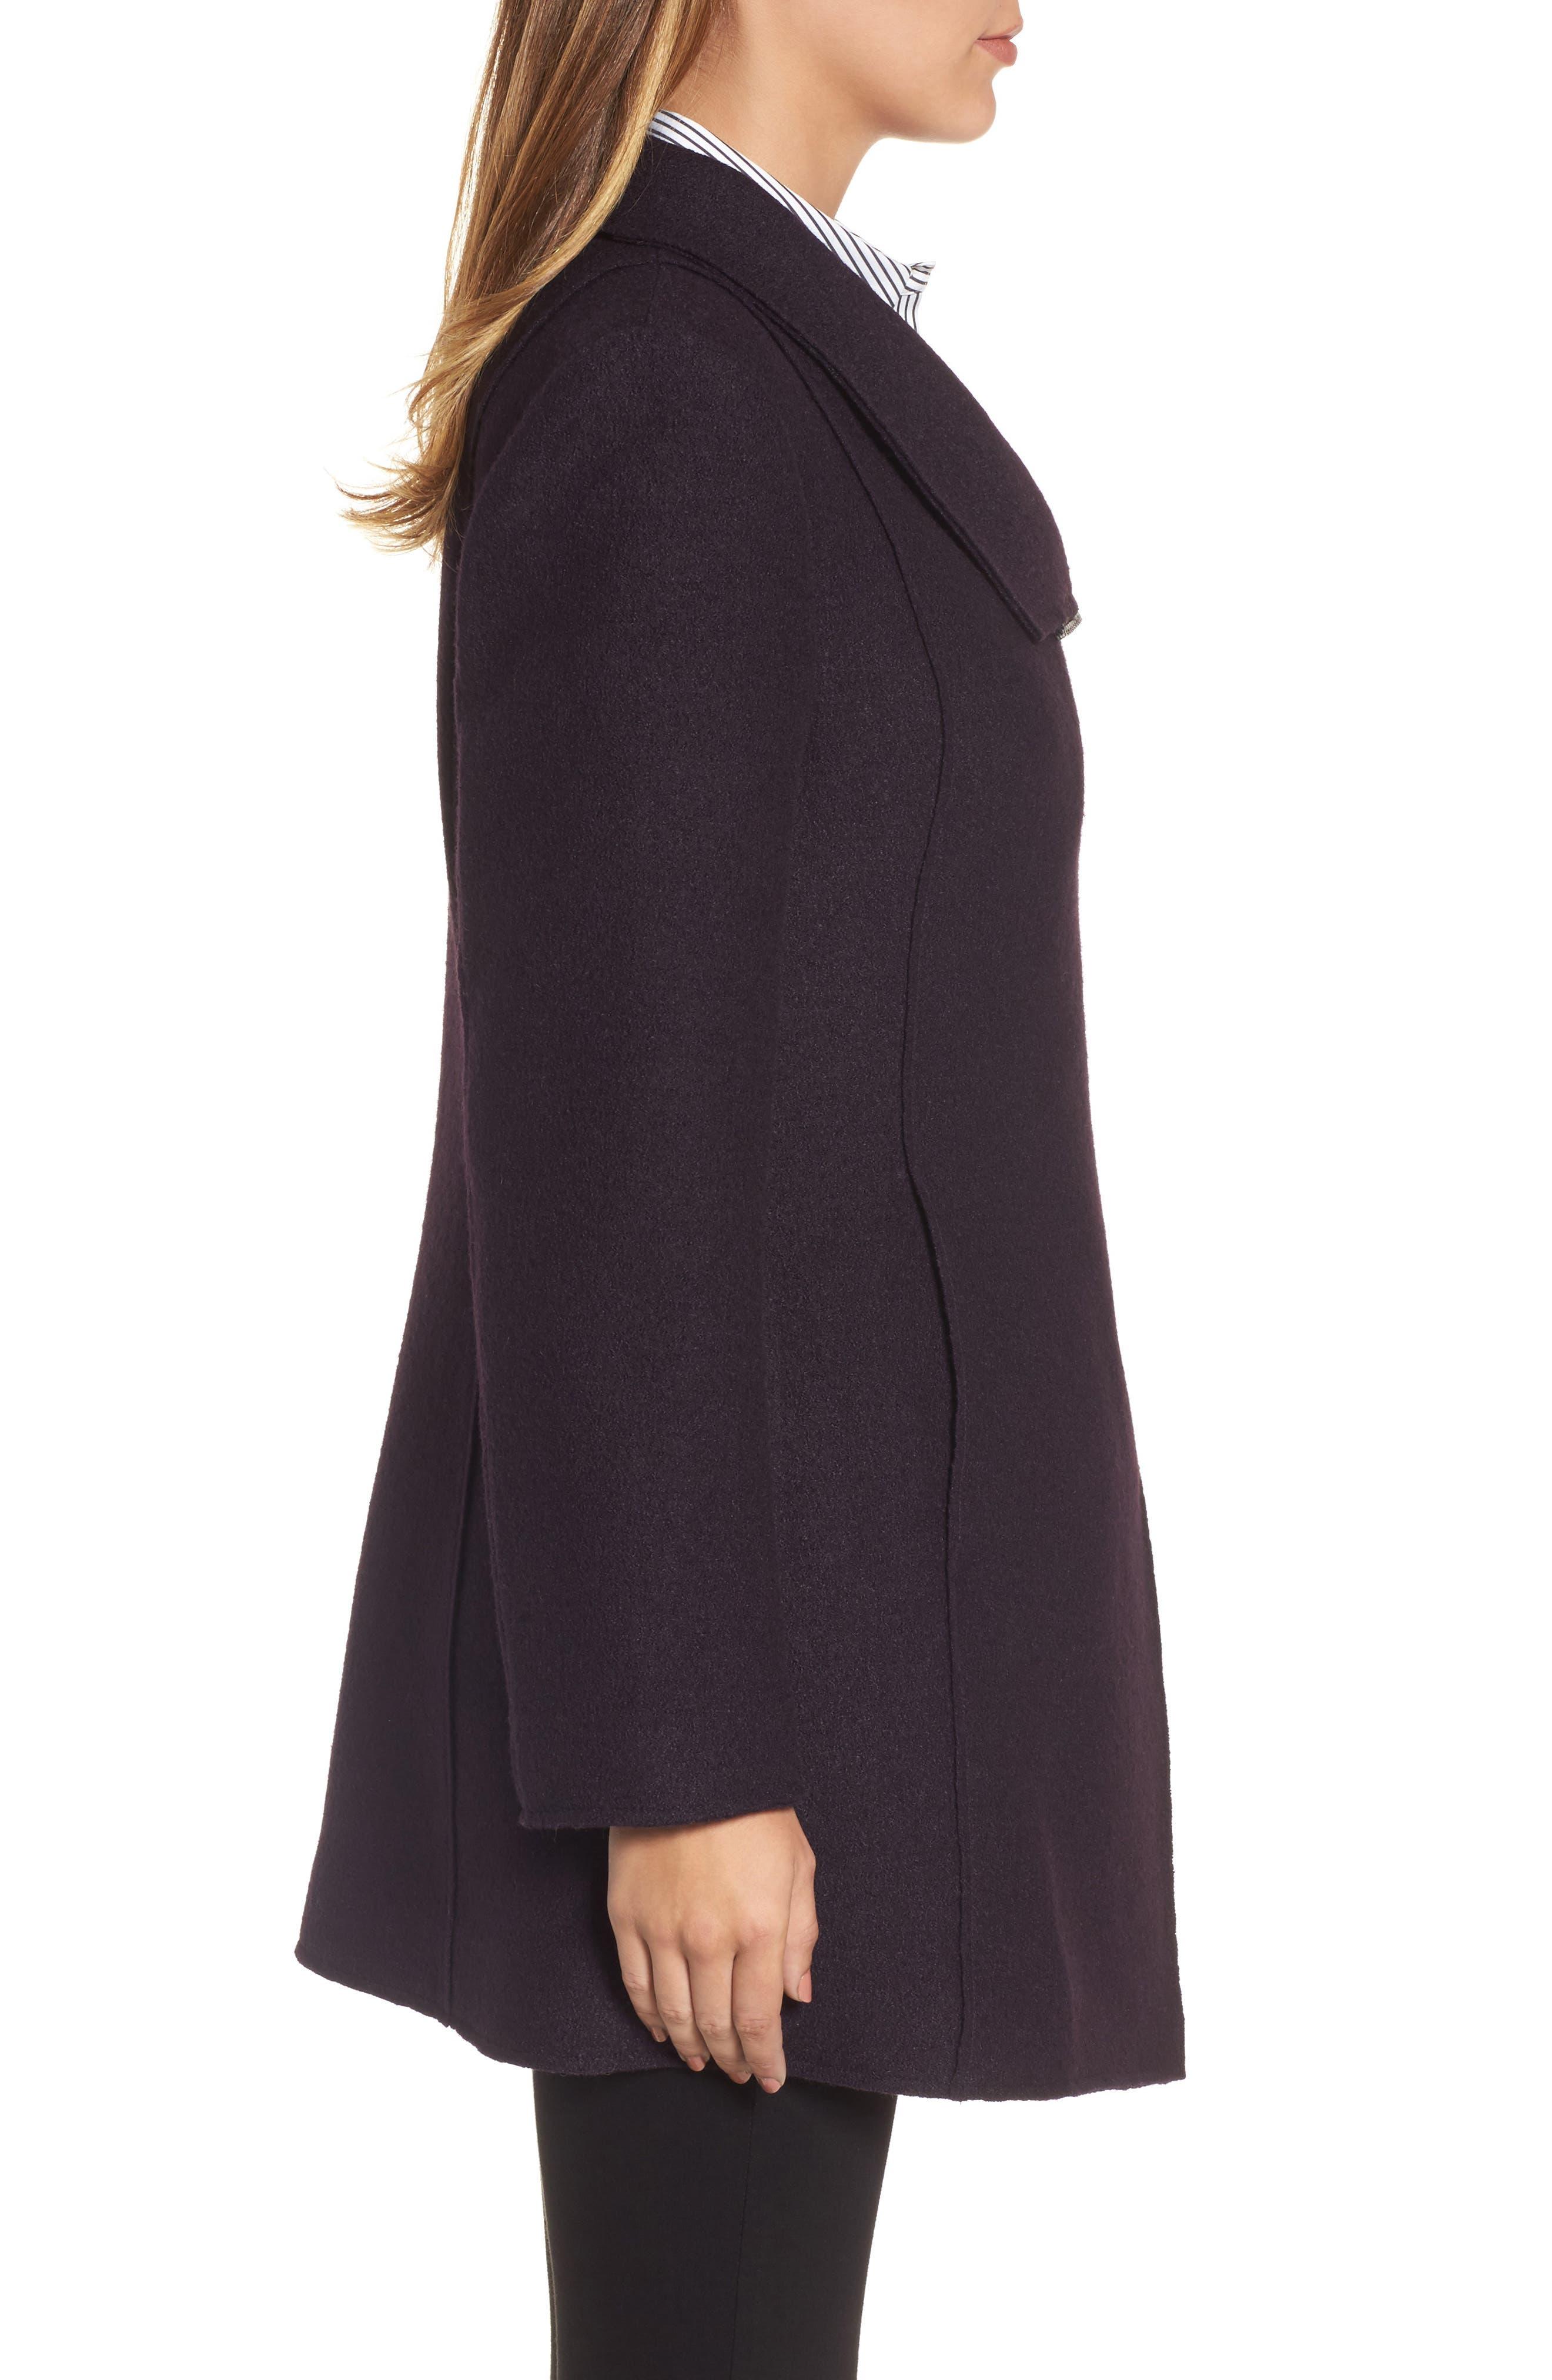 HALOGEN<SUP>®</SUP>, Asymmetrical Zip Boiled Wool Blend Coat, Alternate thumbnail 4, color, 500